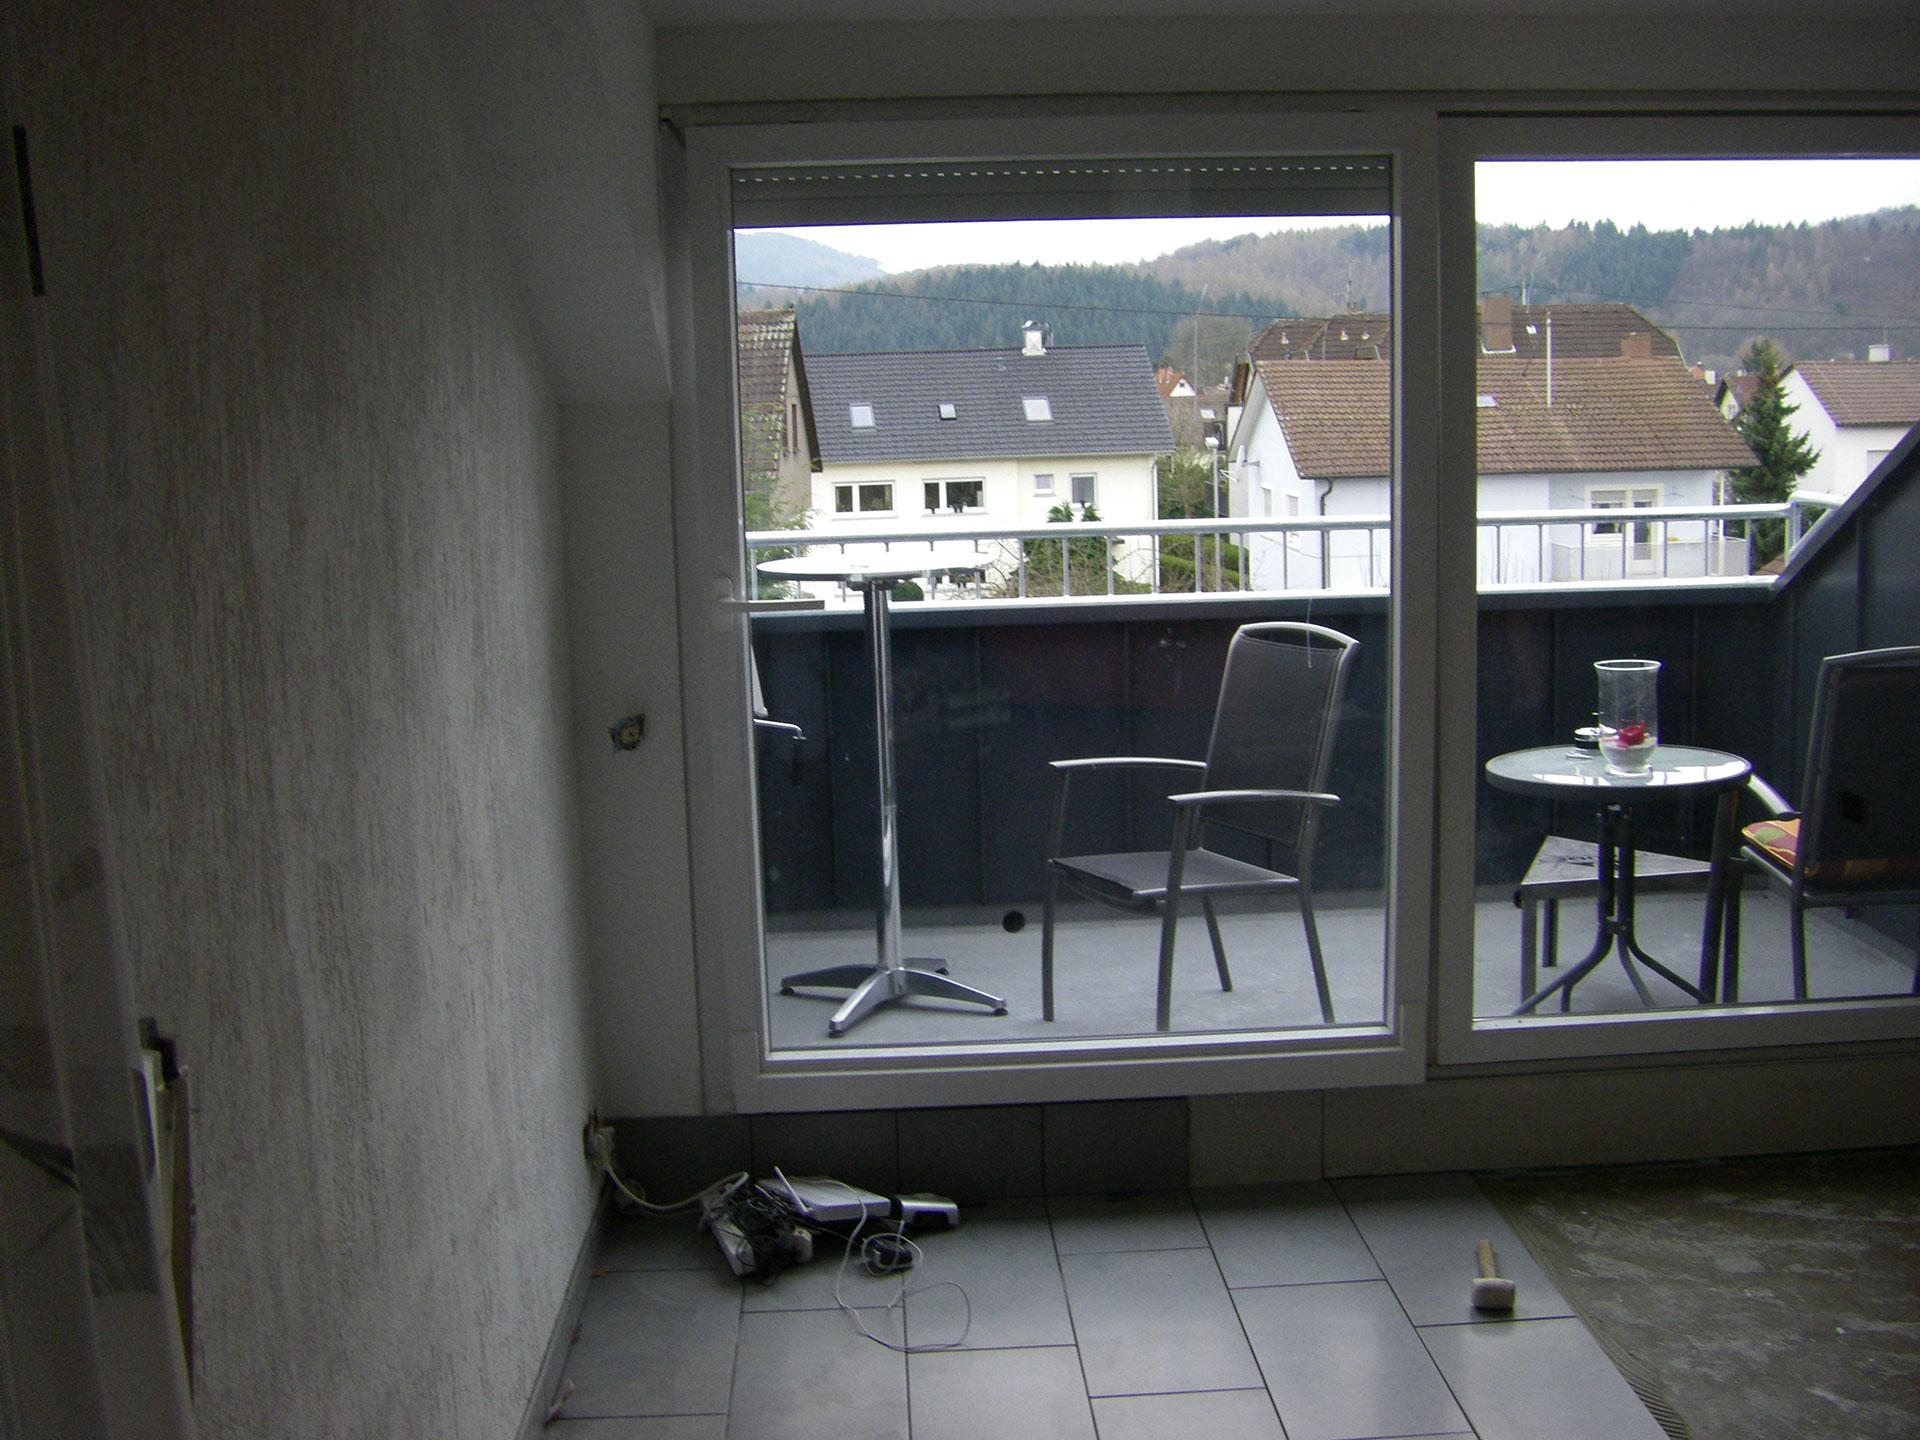 dachloggia kosten excellent startbild with dachloggia kosten gallery with dachloggia kosten. Black Bedroom Furniture Sets. Home Design Ideas